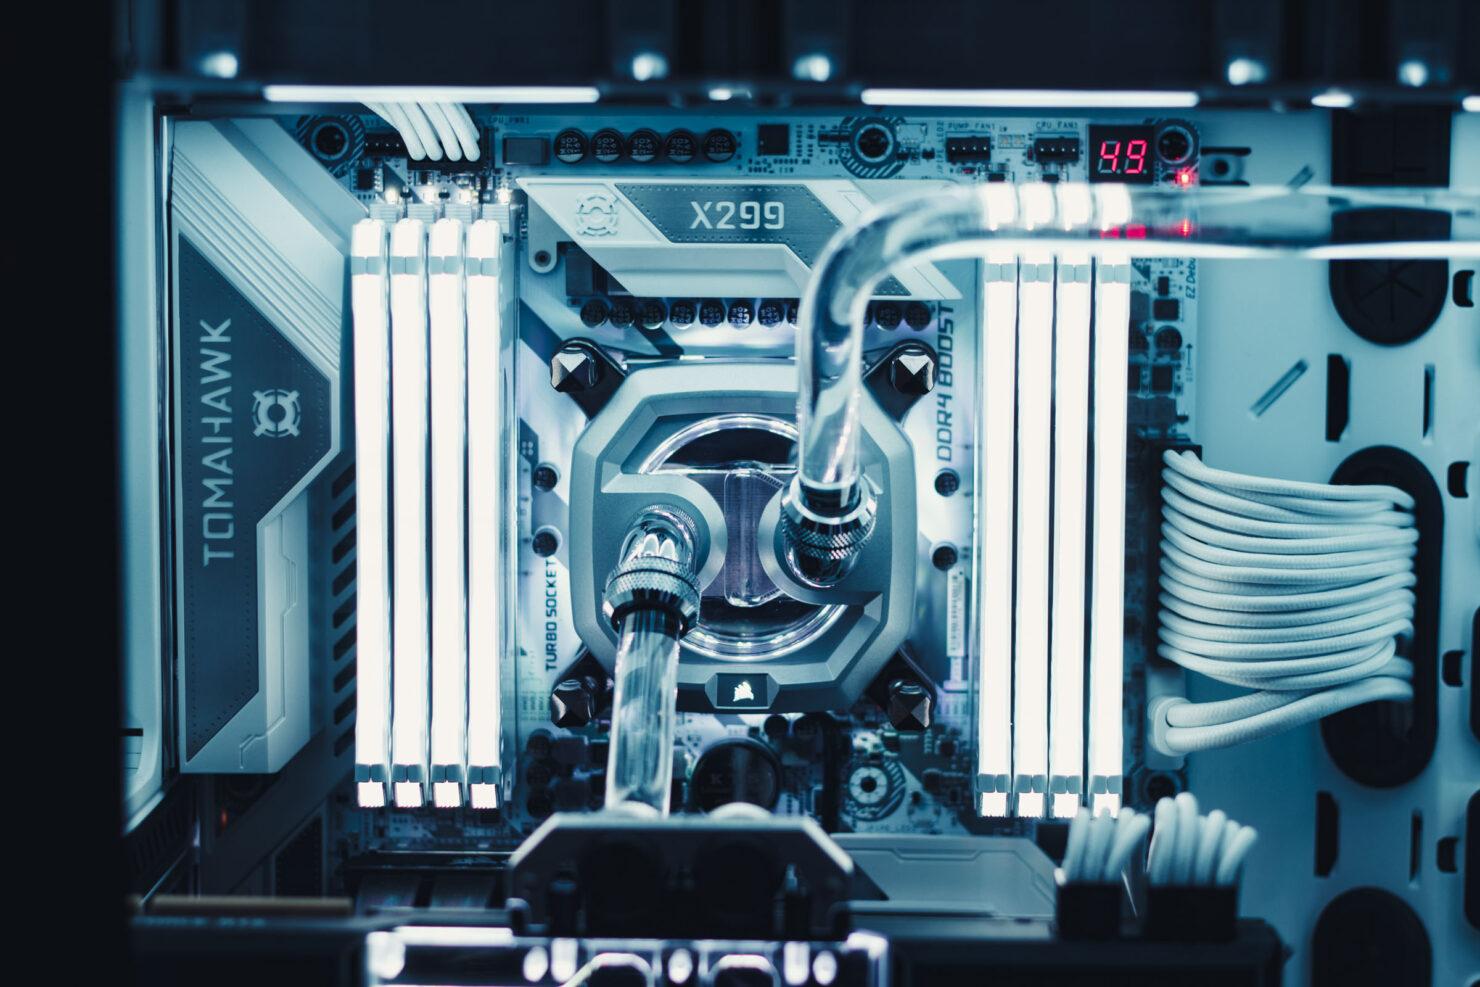 img_2406corsair-hydro-x